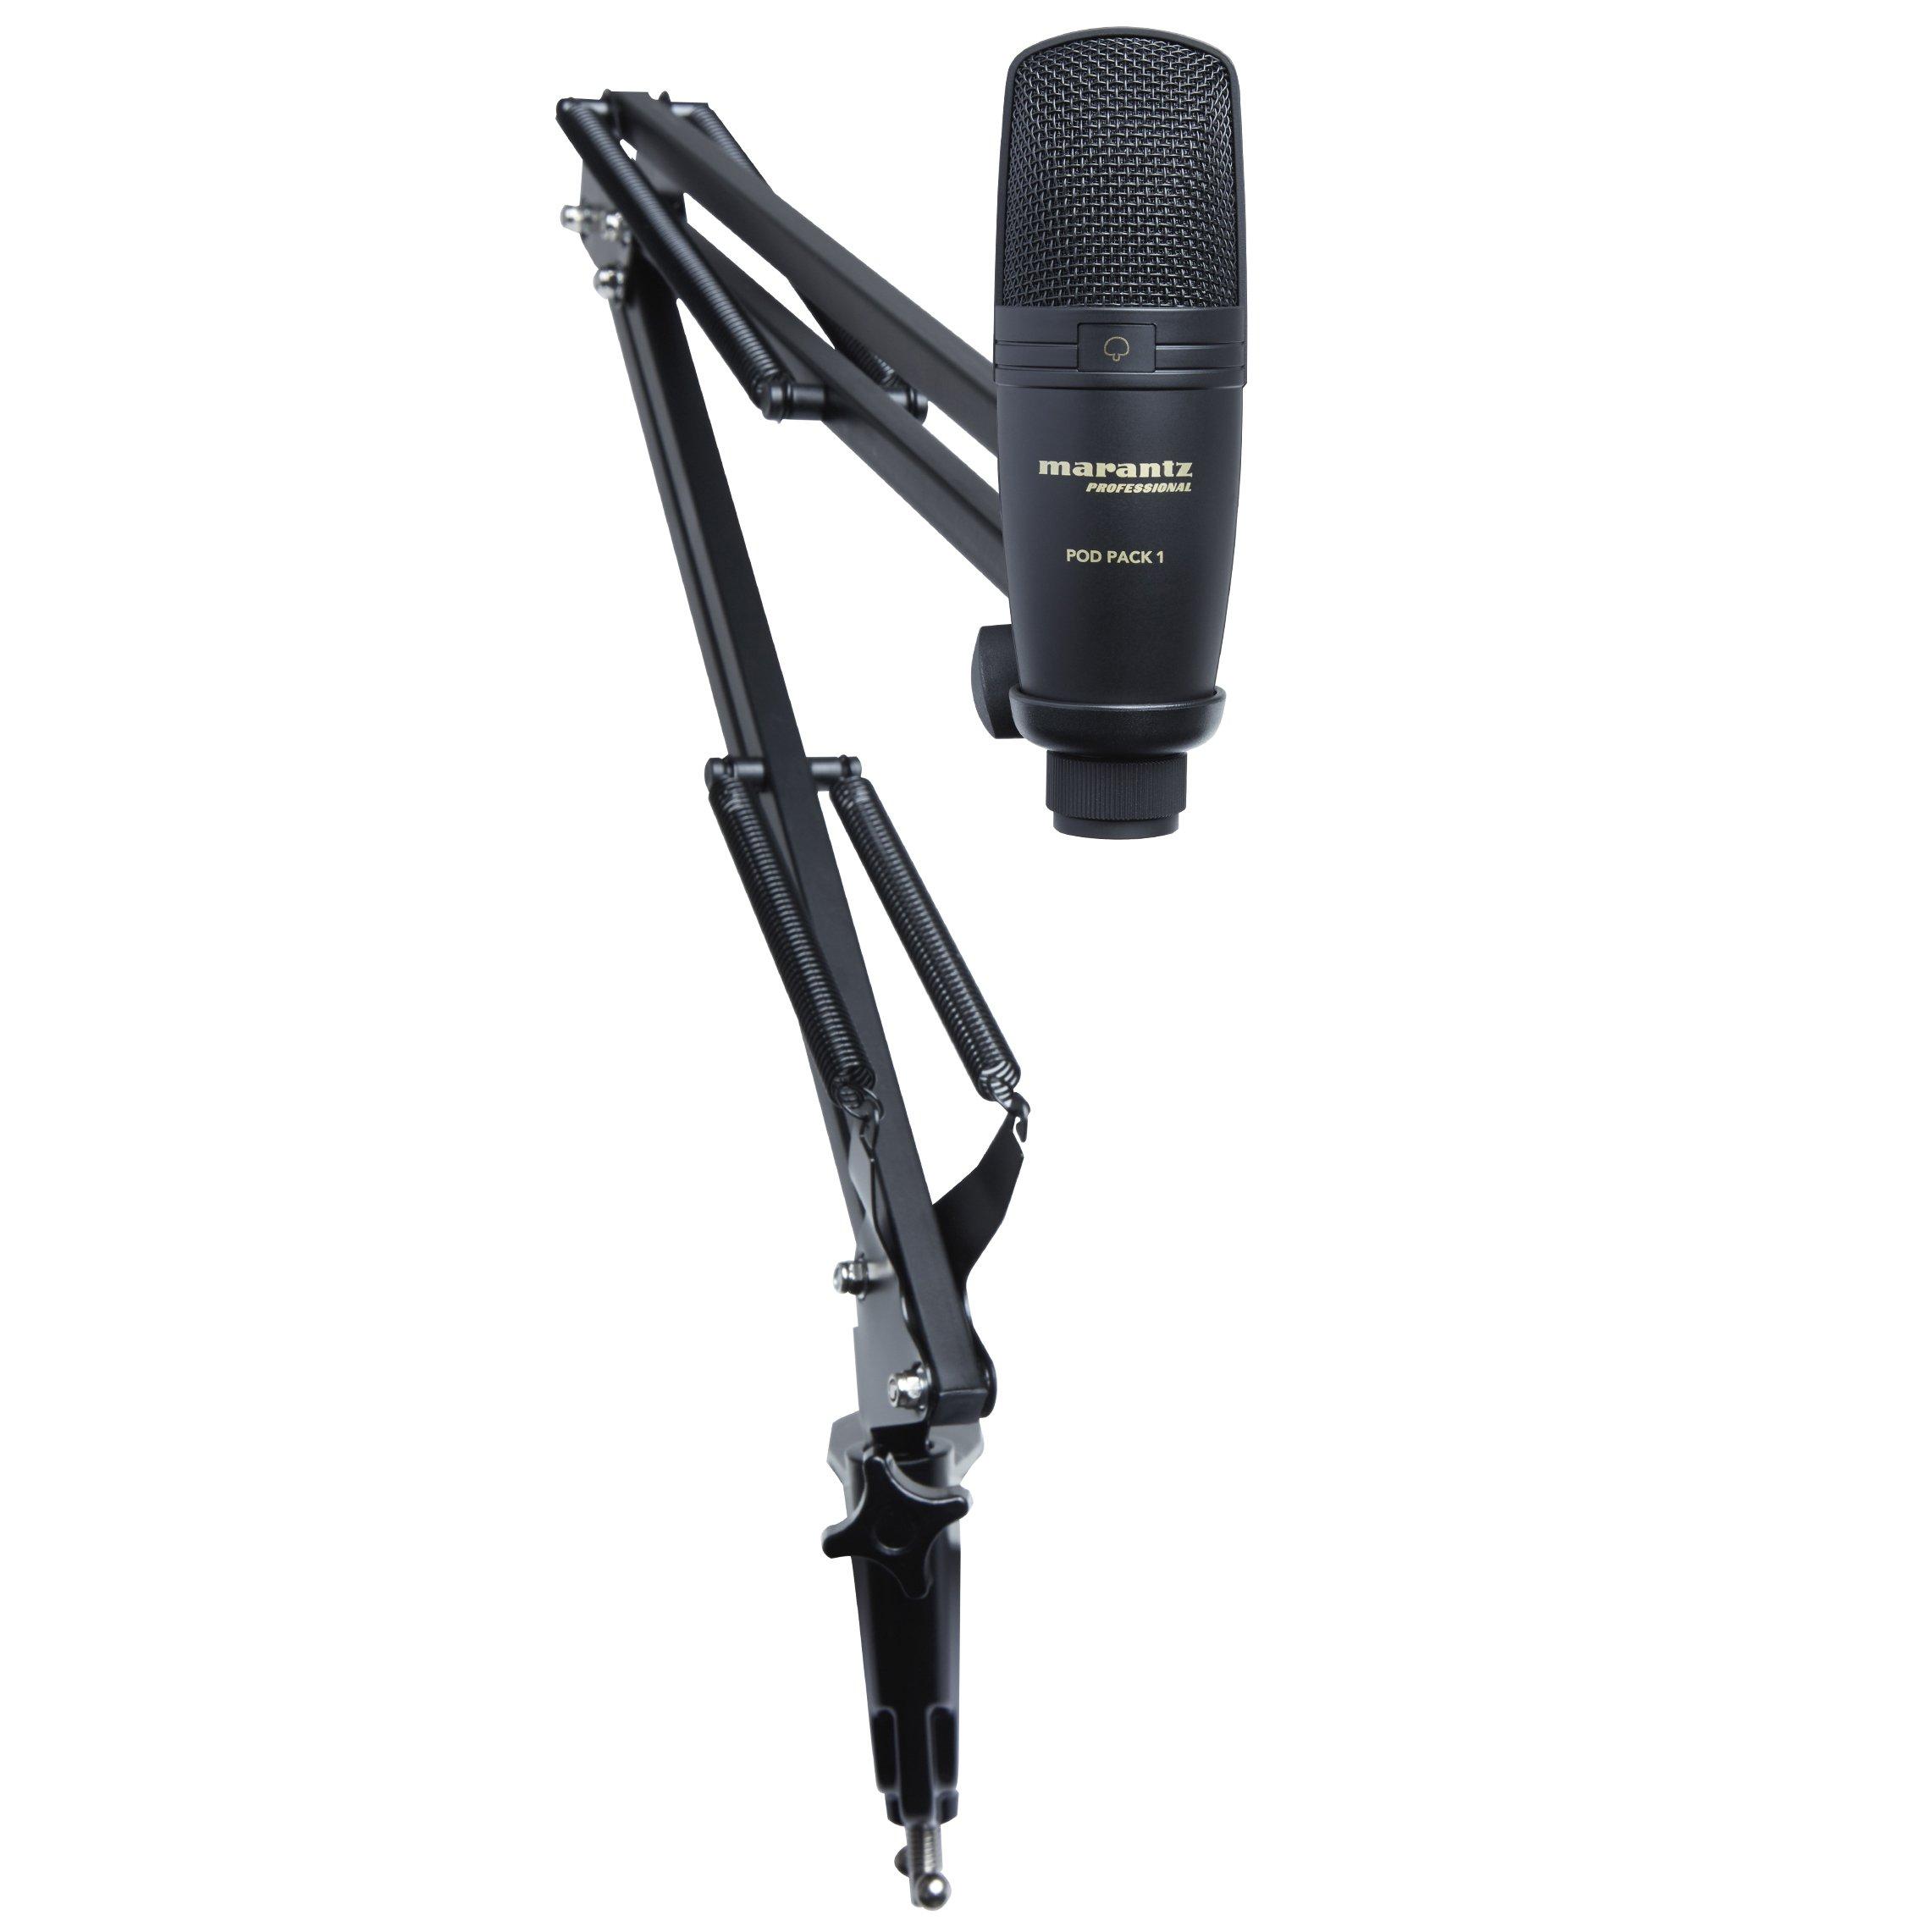 Marantz Professional Pod Pack 1 | Kit Completo De Podcasting Que Incluye Microfono De Condensador Usb Profesional, Sopor